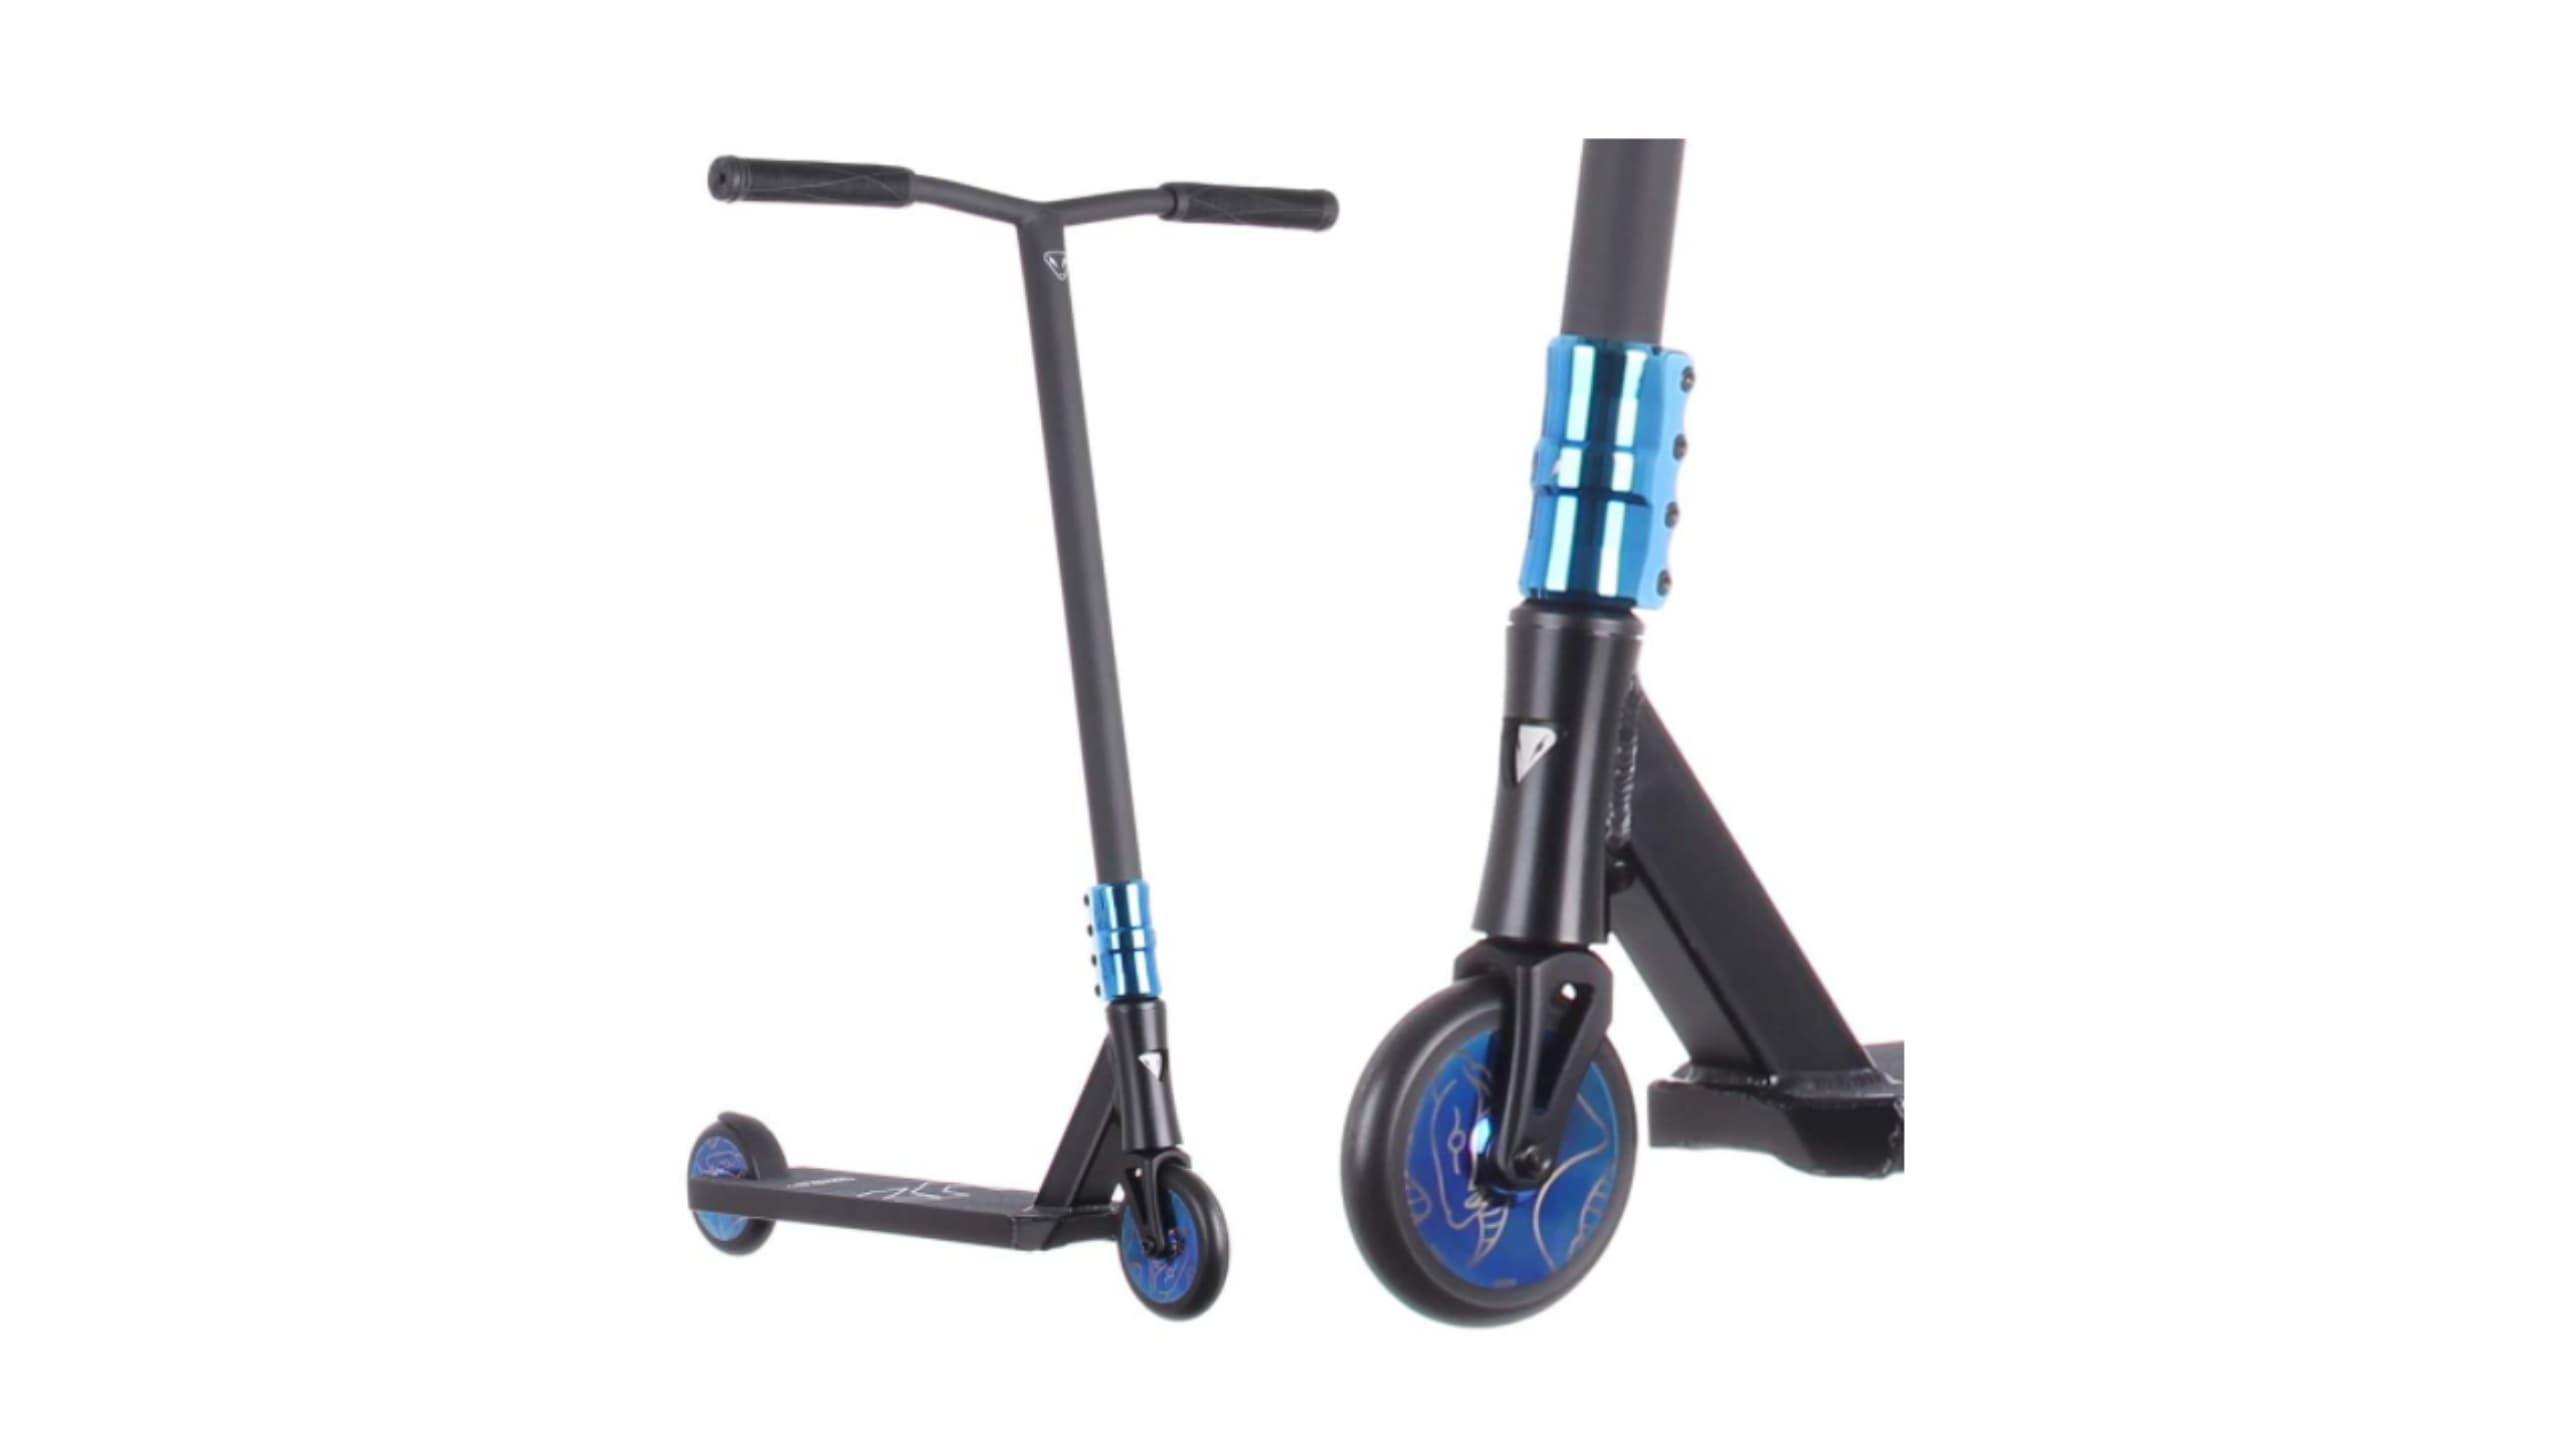 die besten anaquada stunt scooter